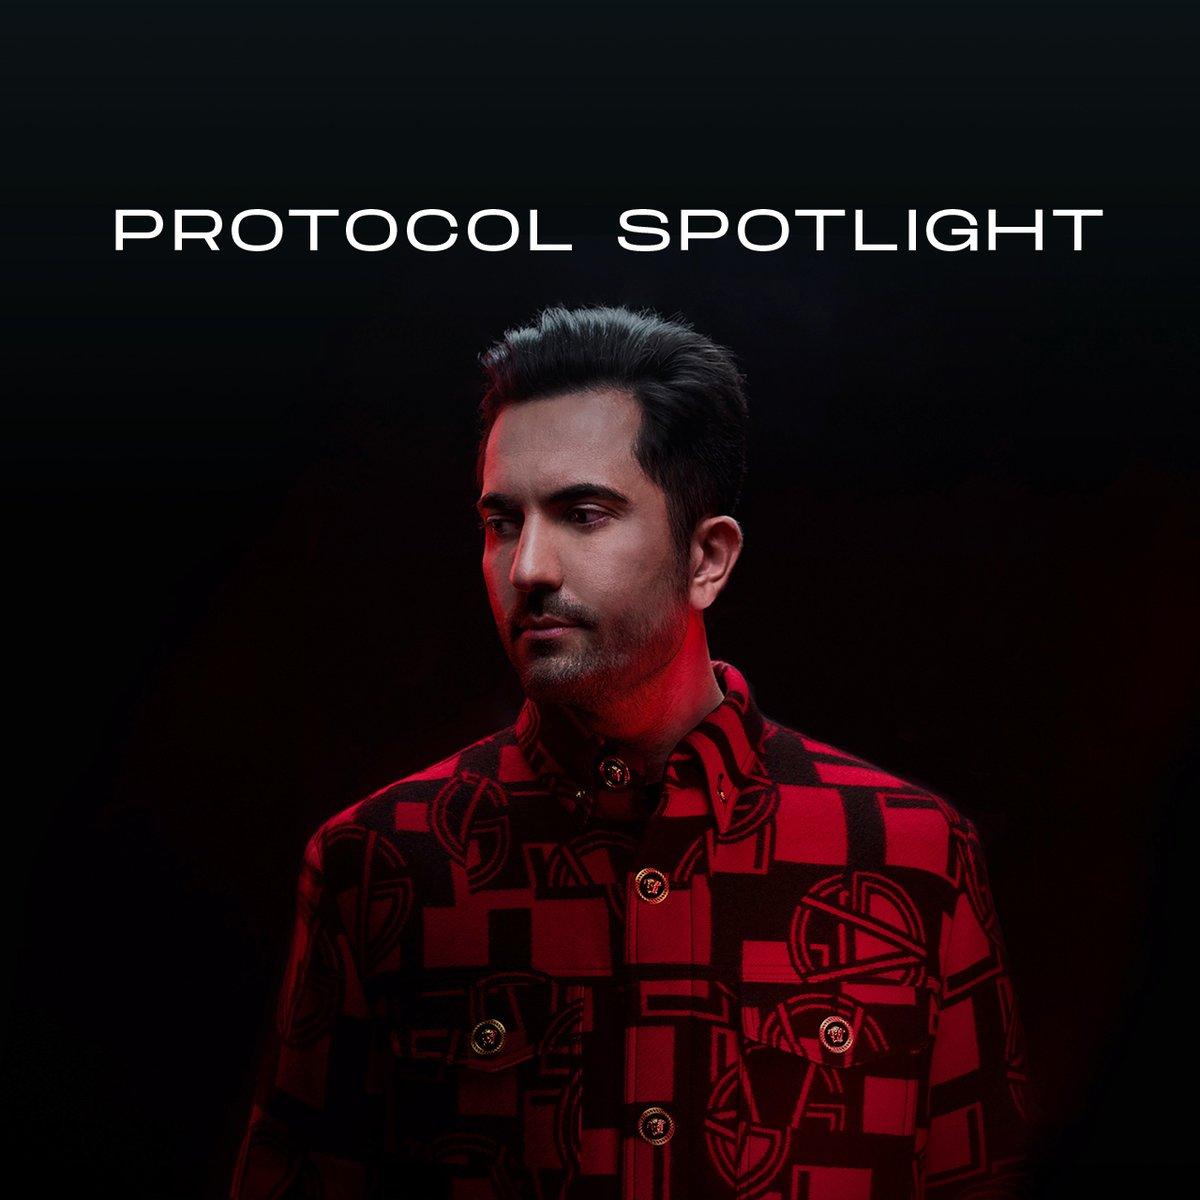 Time for a fresh Protocol Spotlight Playlist! 💡 This week curated by Protocol legend @denizkoyumusic! 👉 Listen now on #Spotify #AppleMusic or #Deezer: https://t.co/4v1YkZm1wR https://t.co/o0vjTJoQjo